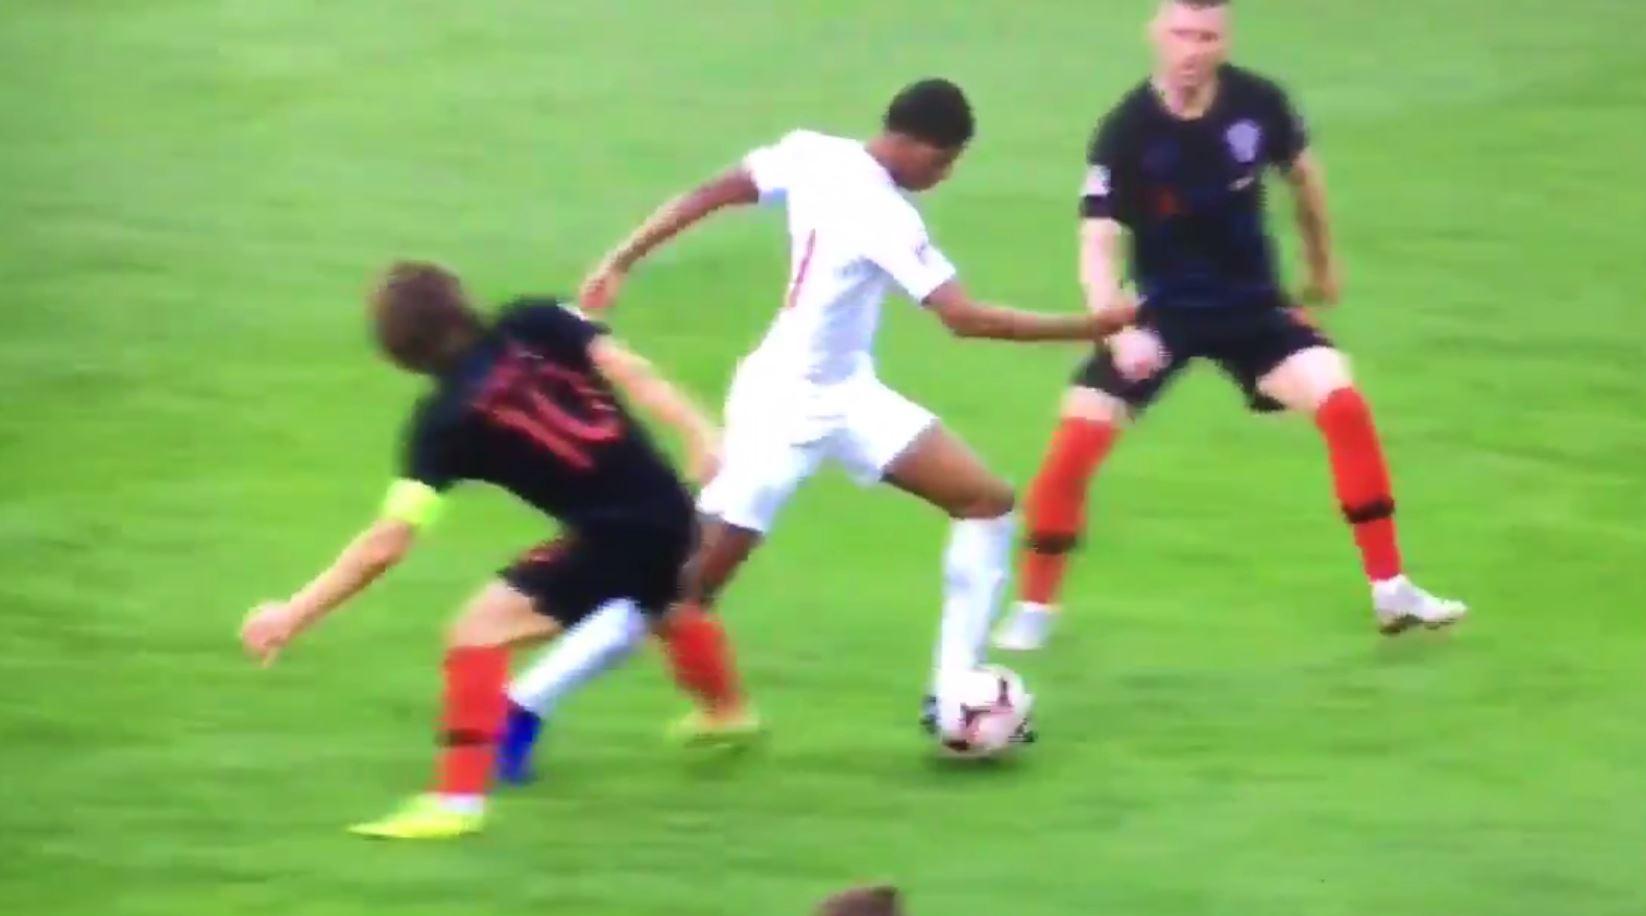 Marcus Rashford sends Luka Modric back to Spurs with superb skill in England vs Croatia